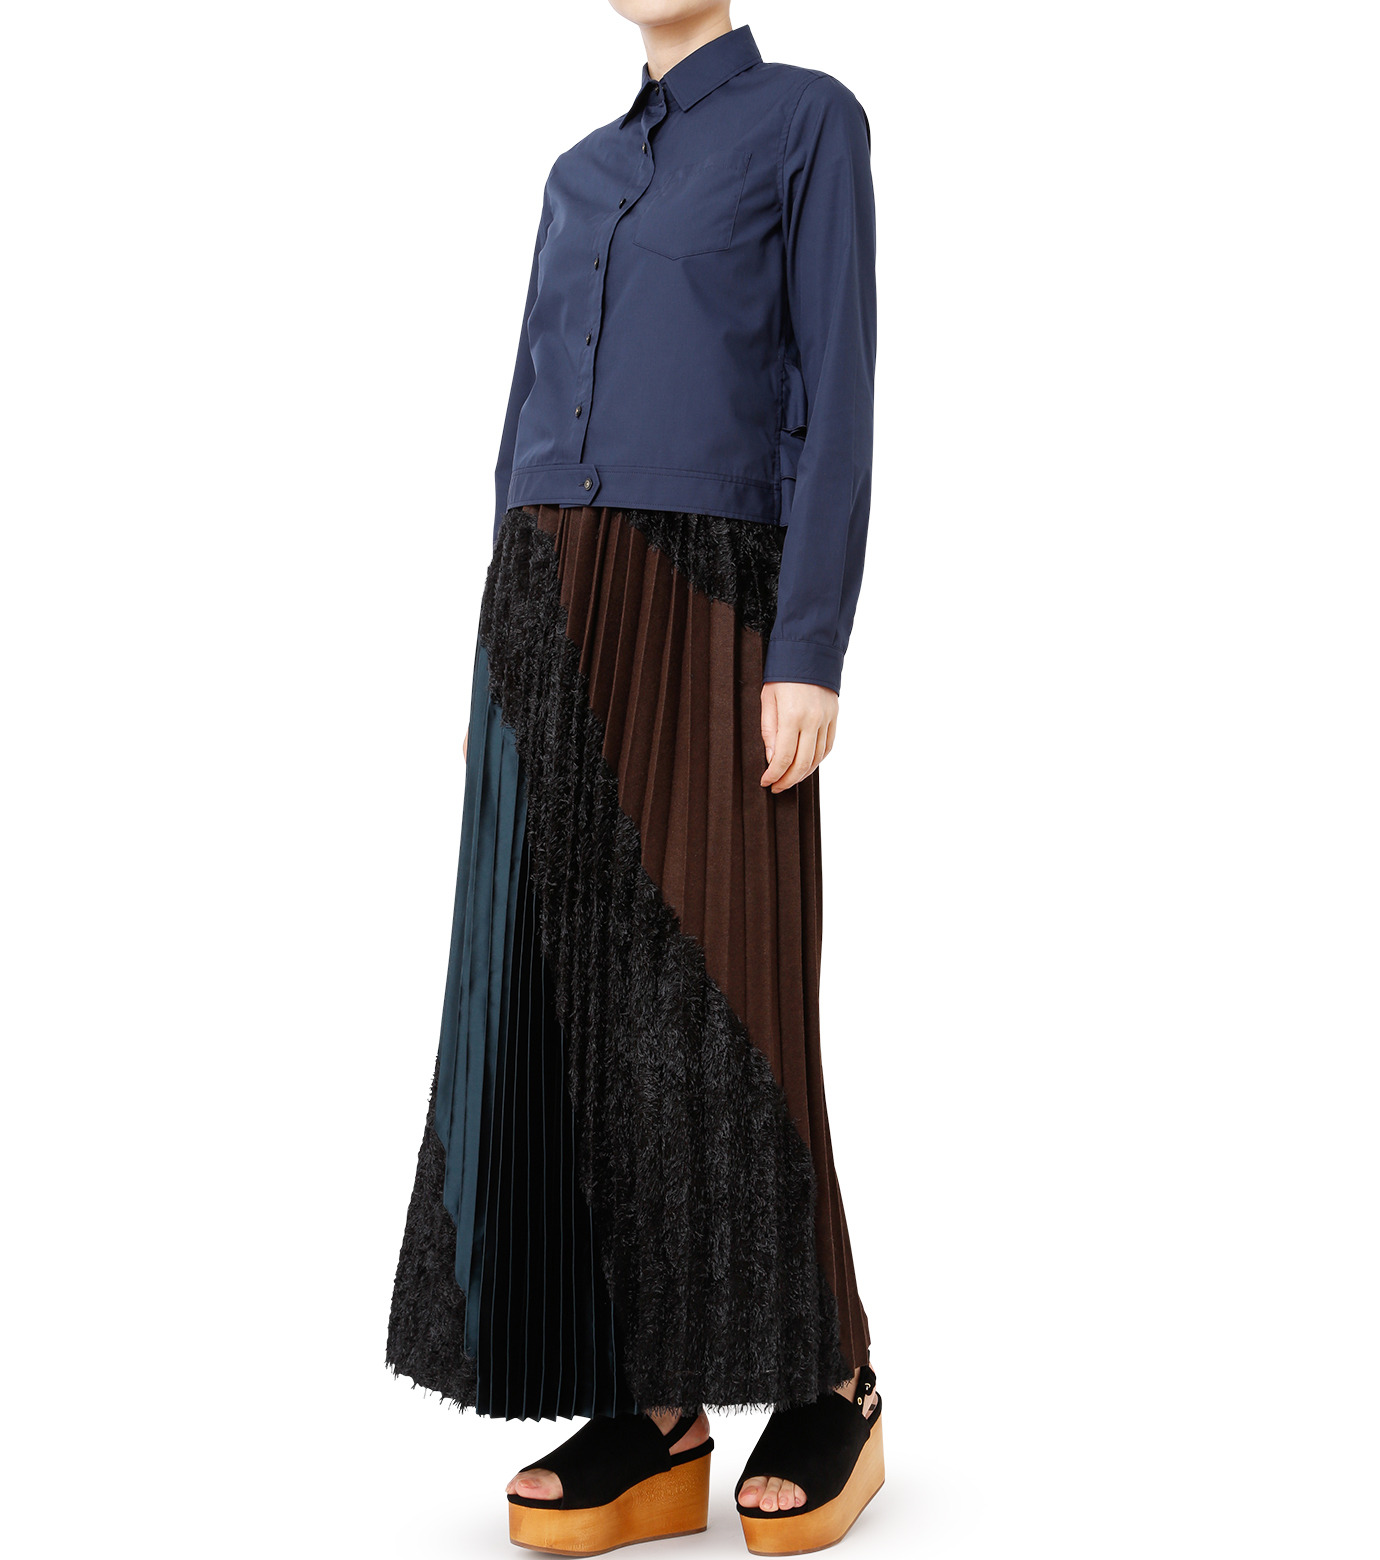 KOLOR(カラー)のShirt w/Back Ruffle Detail-NAVY(シャツ/shirt)-16WCL-B02134-93 拡大詳細画像3